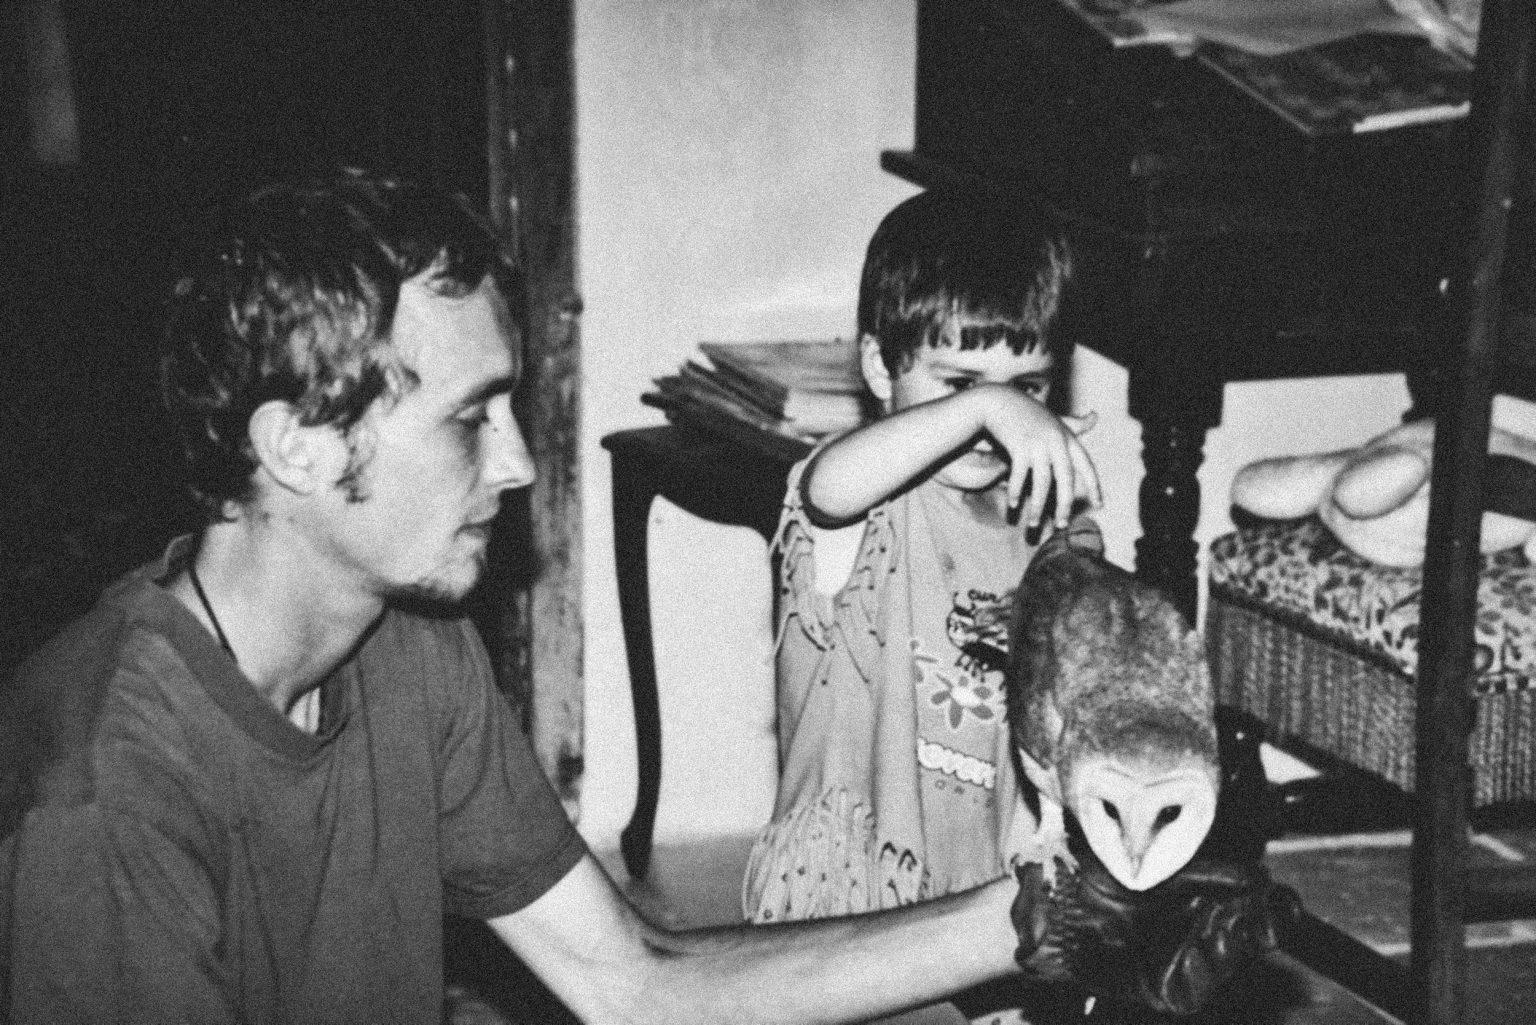 Valdivienne, France, May 2019 - Archival image, Tristan at 18 with his sister and a barn owl © Family of Tristan Plot. >< Valdivienne, Francia, maggio 2019 - Foto di archivio, Tristan a 18 anni con sua sorella e un barbagianni © Famiglia di Tristan Plot.*** SPECIAL   FEE   APPLIES *** *** Local Caption *** 01489318